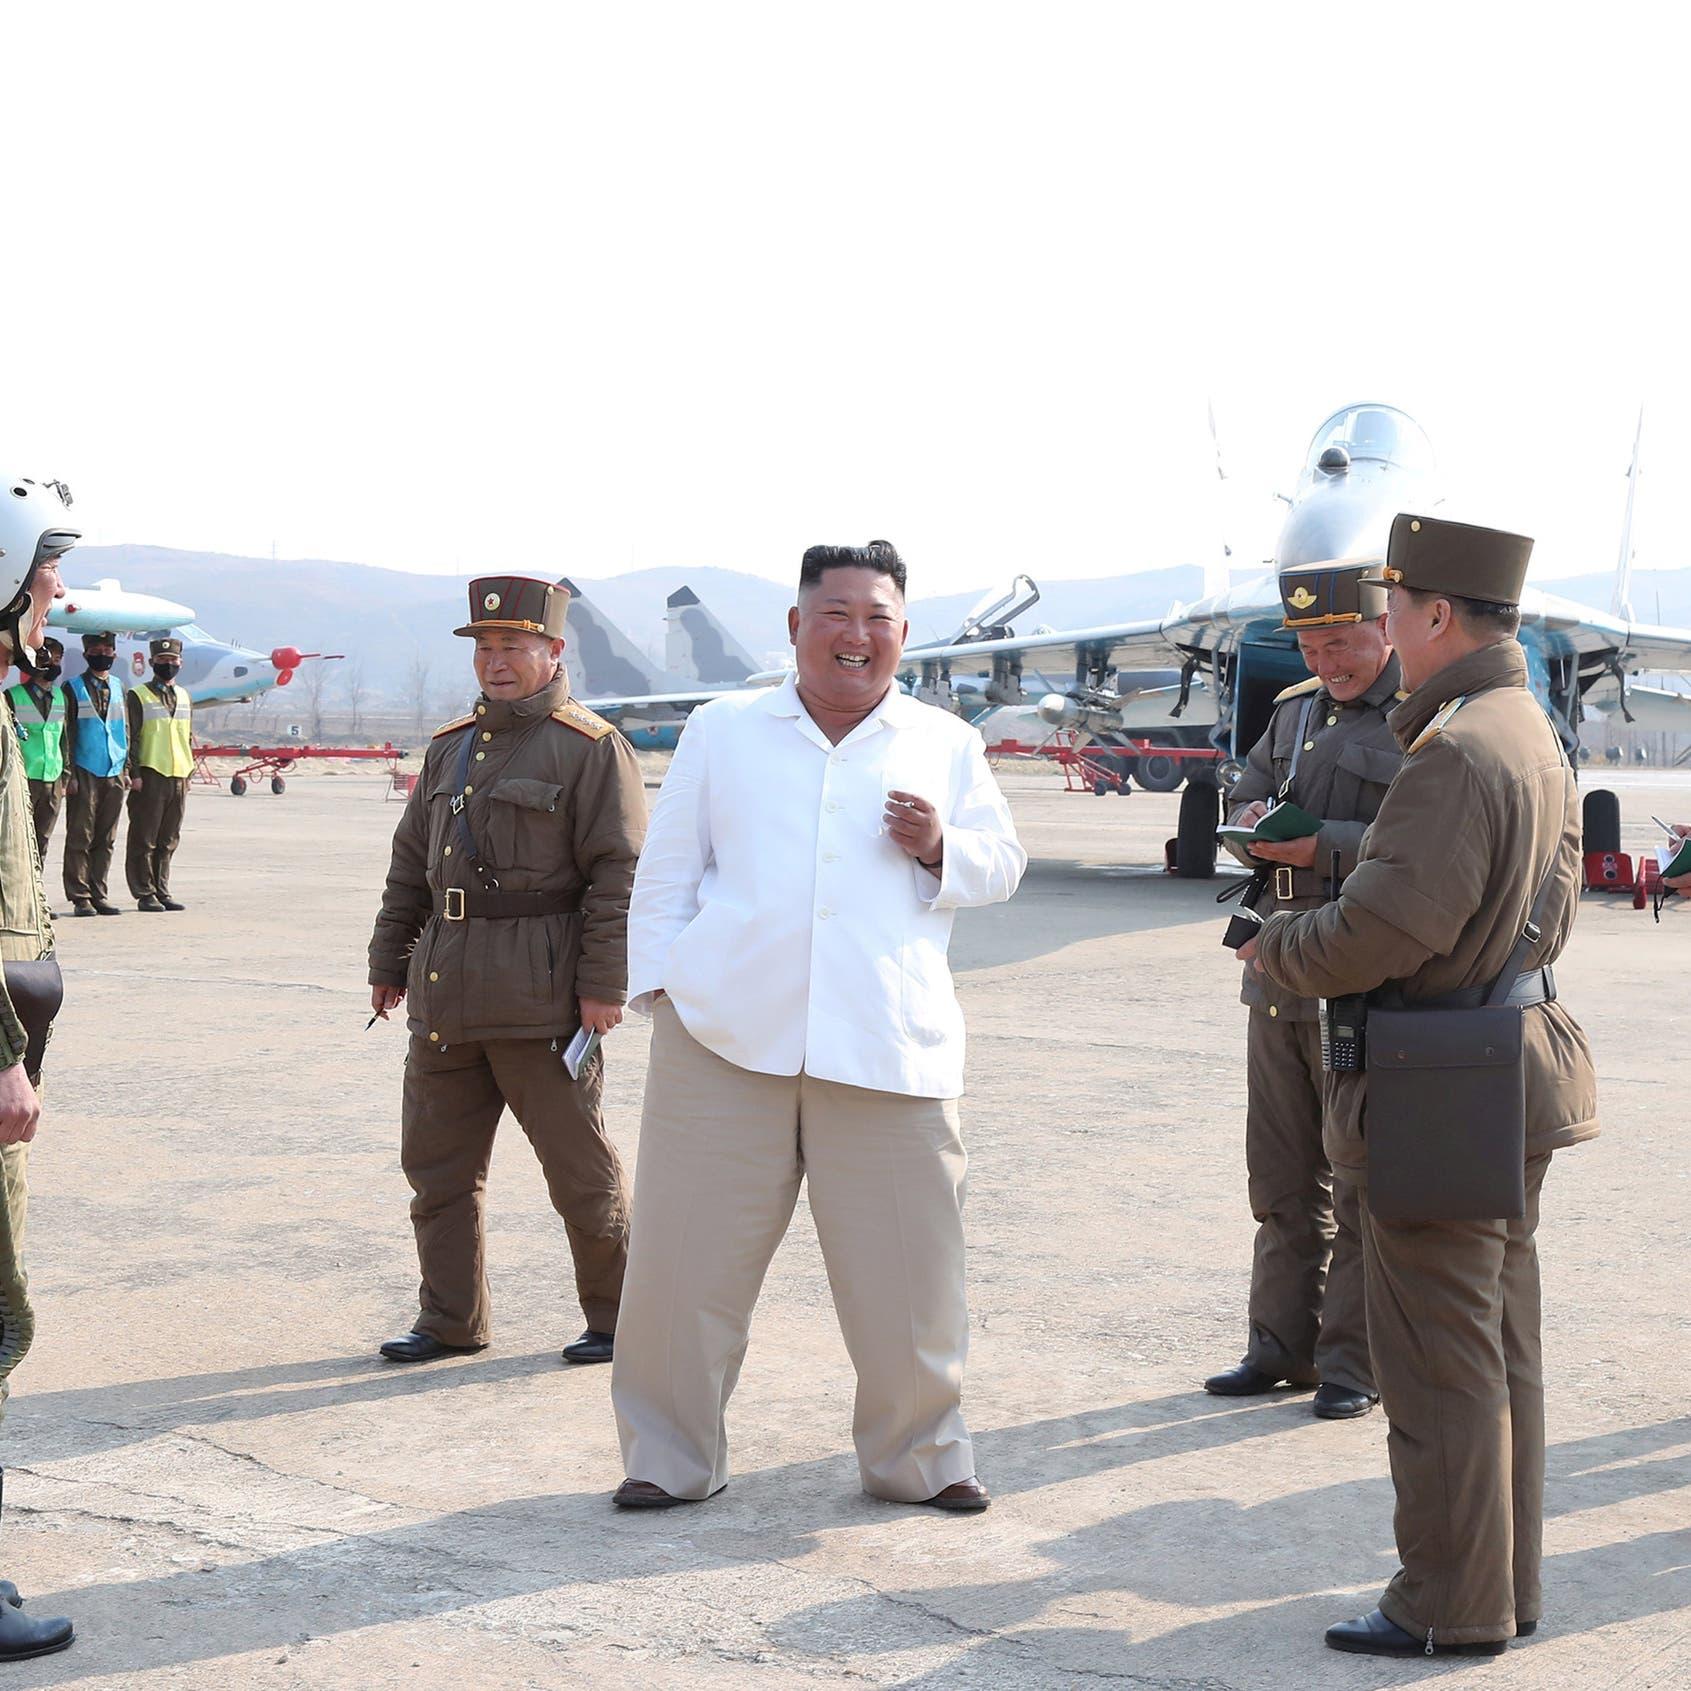 صور لزعيم كوريا طفلاً.. مراهق شرس يركل ويبصق على زملائه